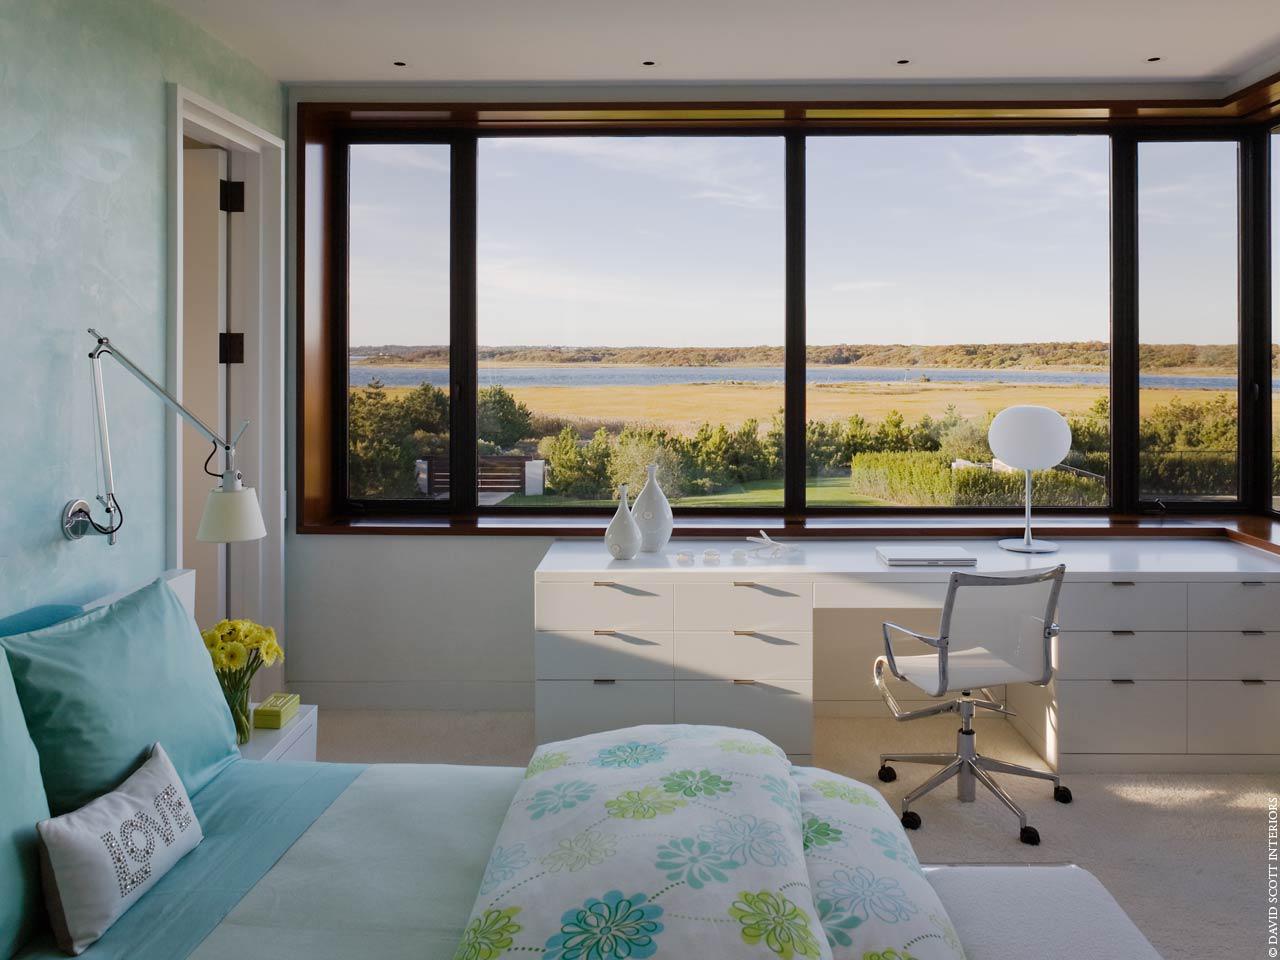 Southampton oceanfront bedroom by David Scott Interiors, LTD.